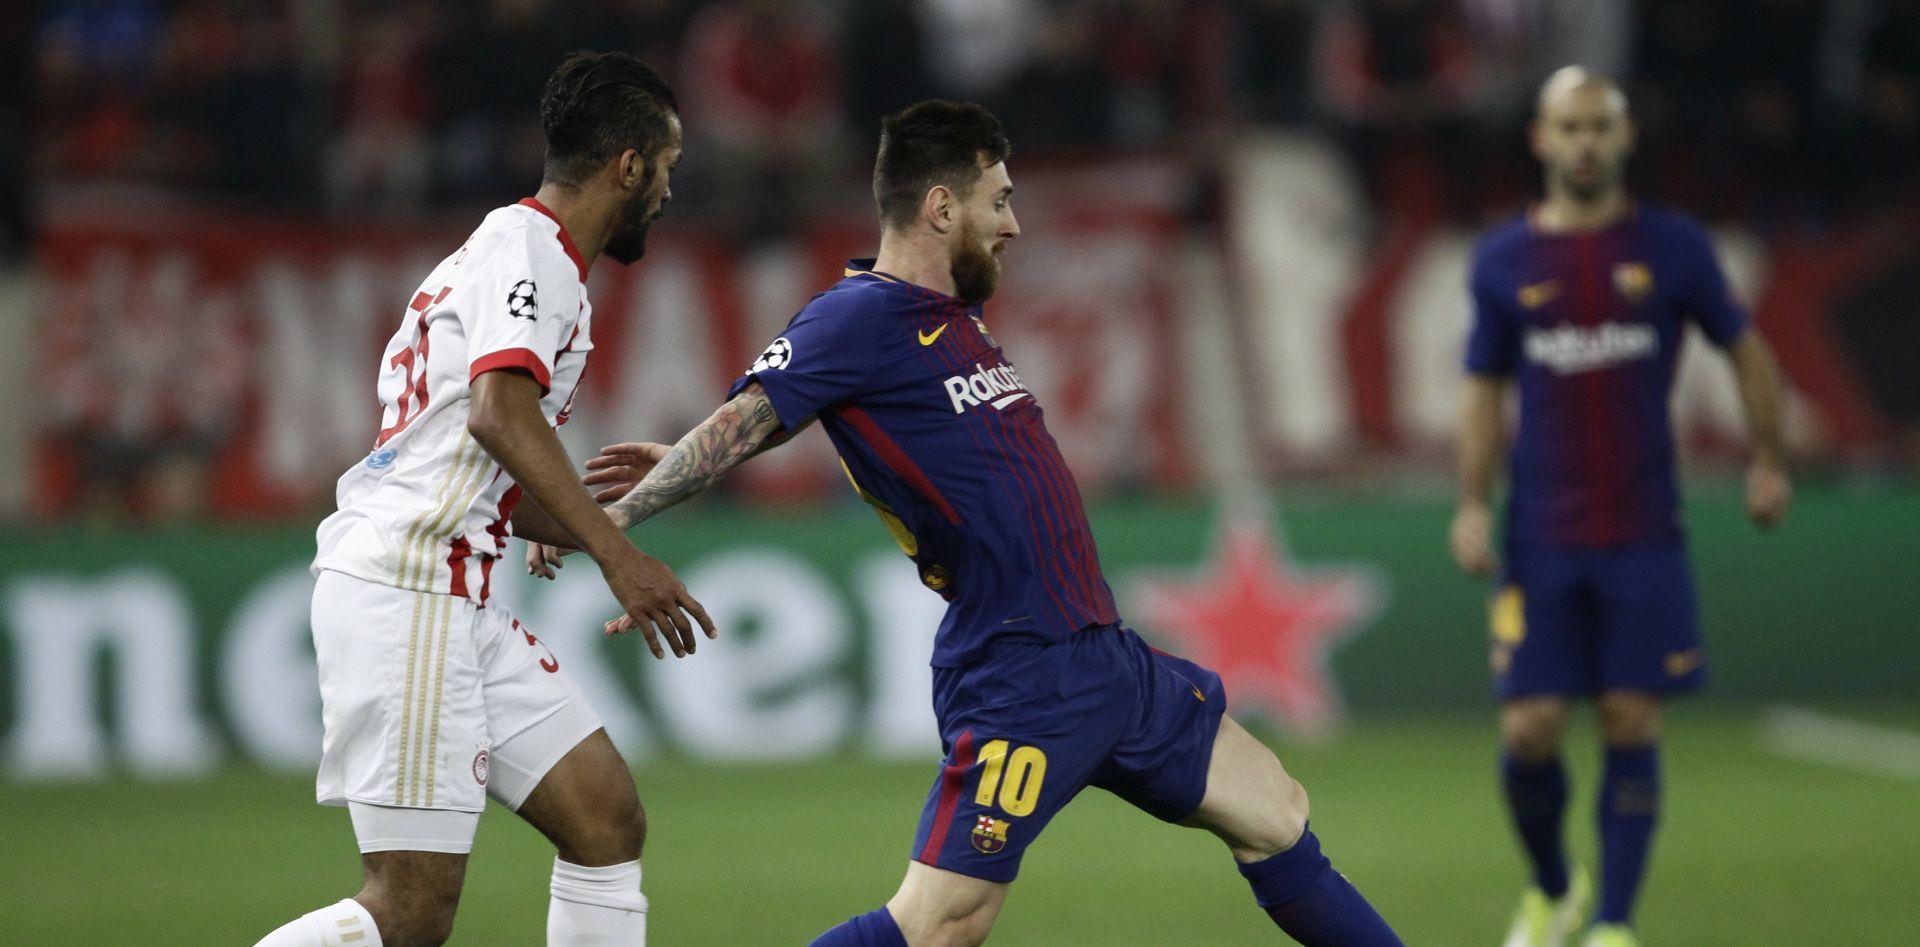 MESSI FULAO PENAL Espanyol srušio Barcelonu, u Madridu izboden navijač